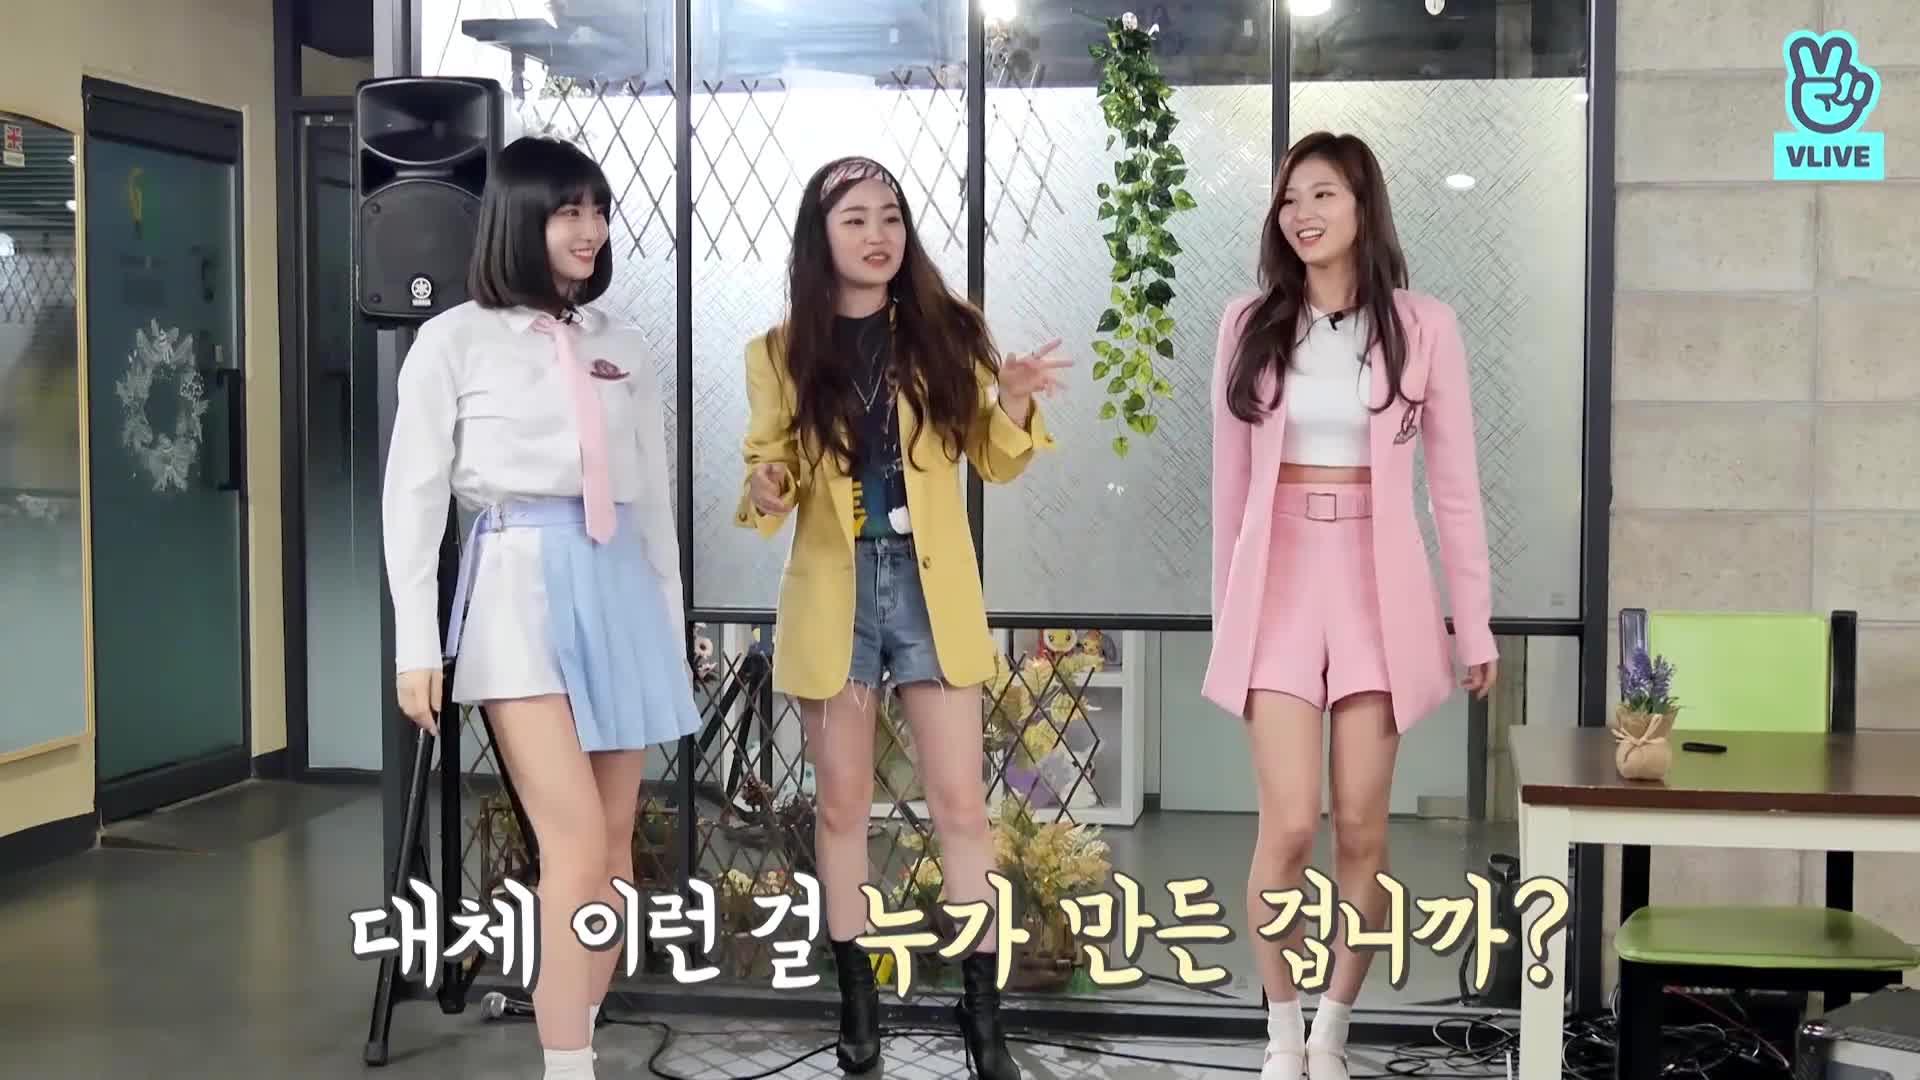 [TWICE 5분 라디오] EP05. 애런(ARRAN) 매력 탐구!